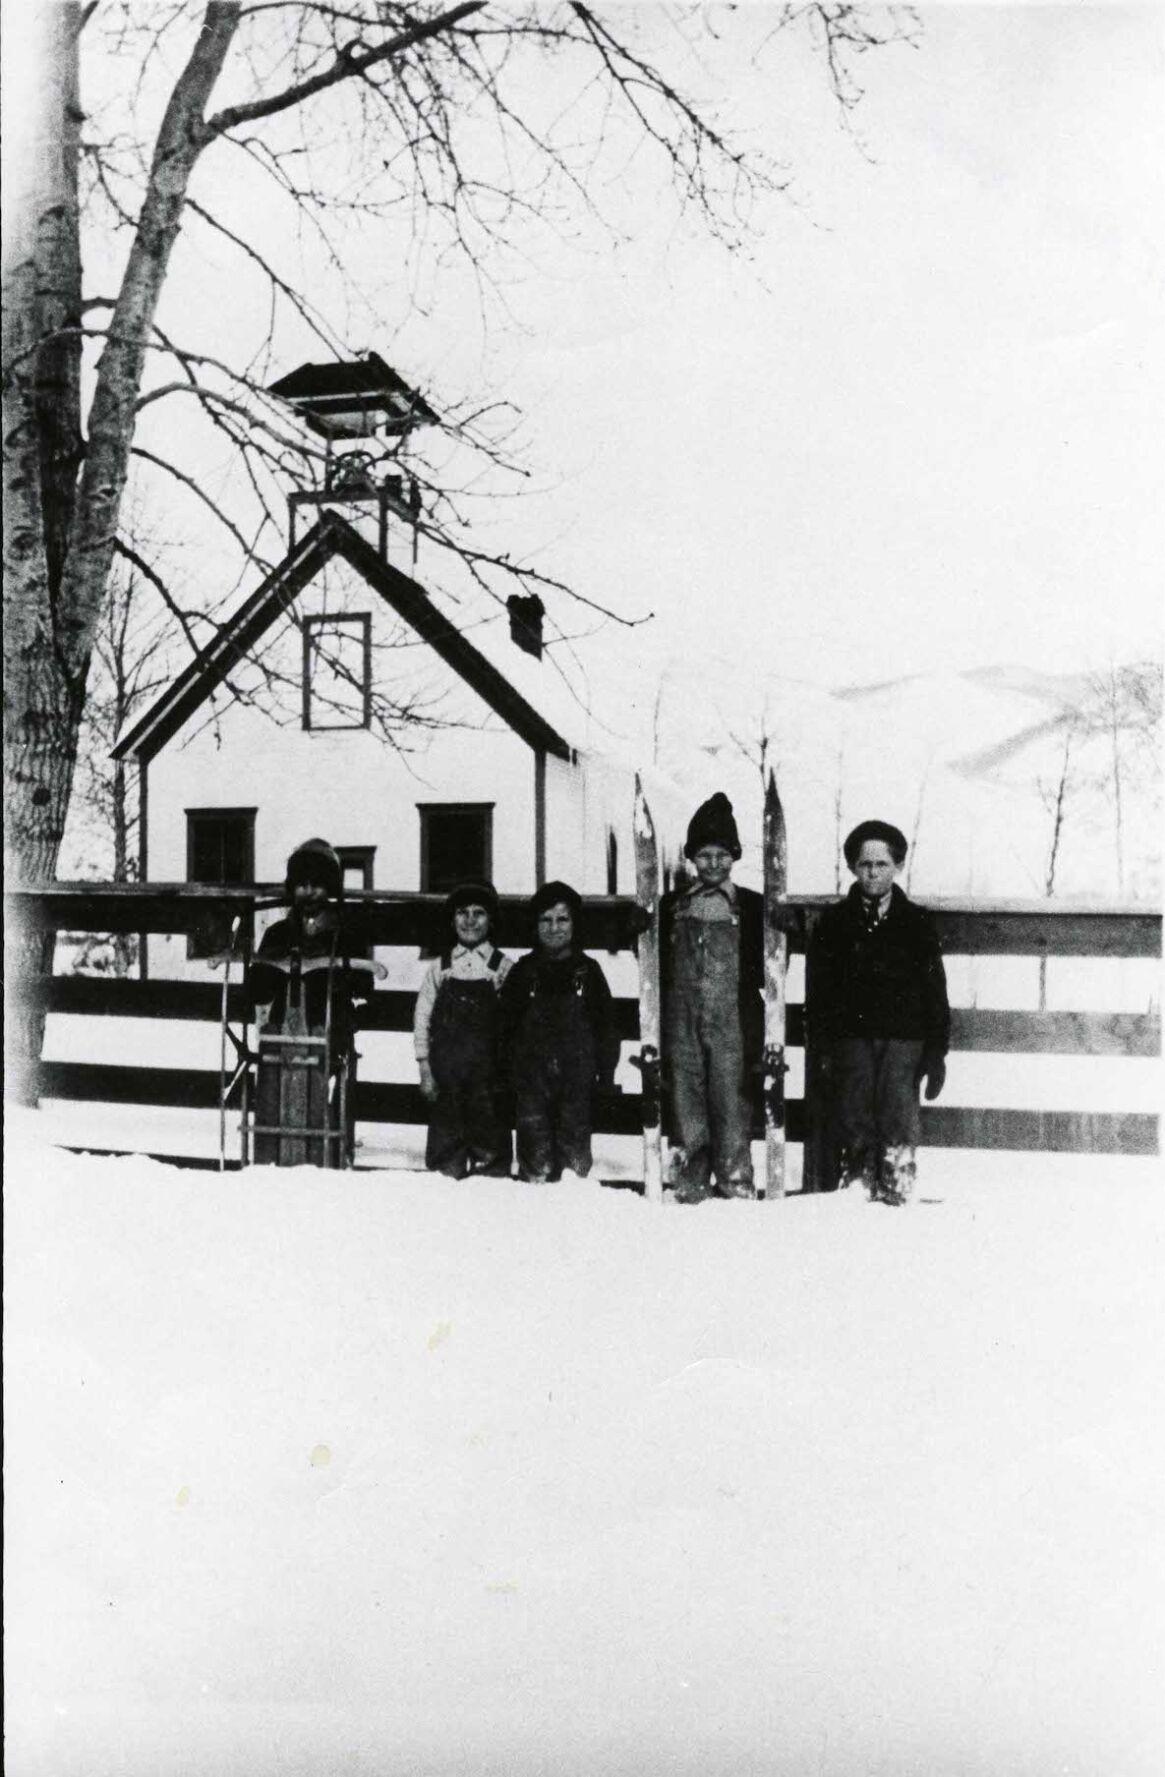 Avon school kids with skis.jpg